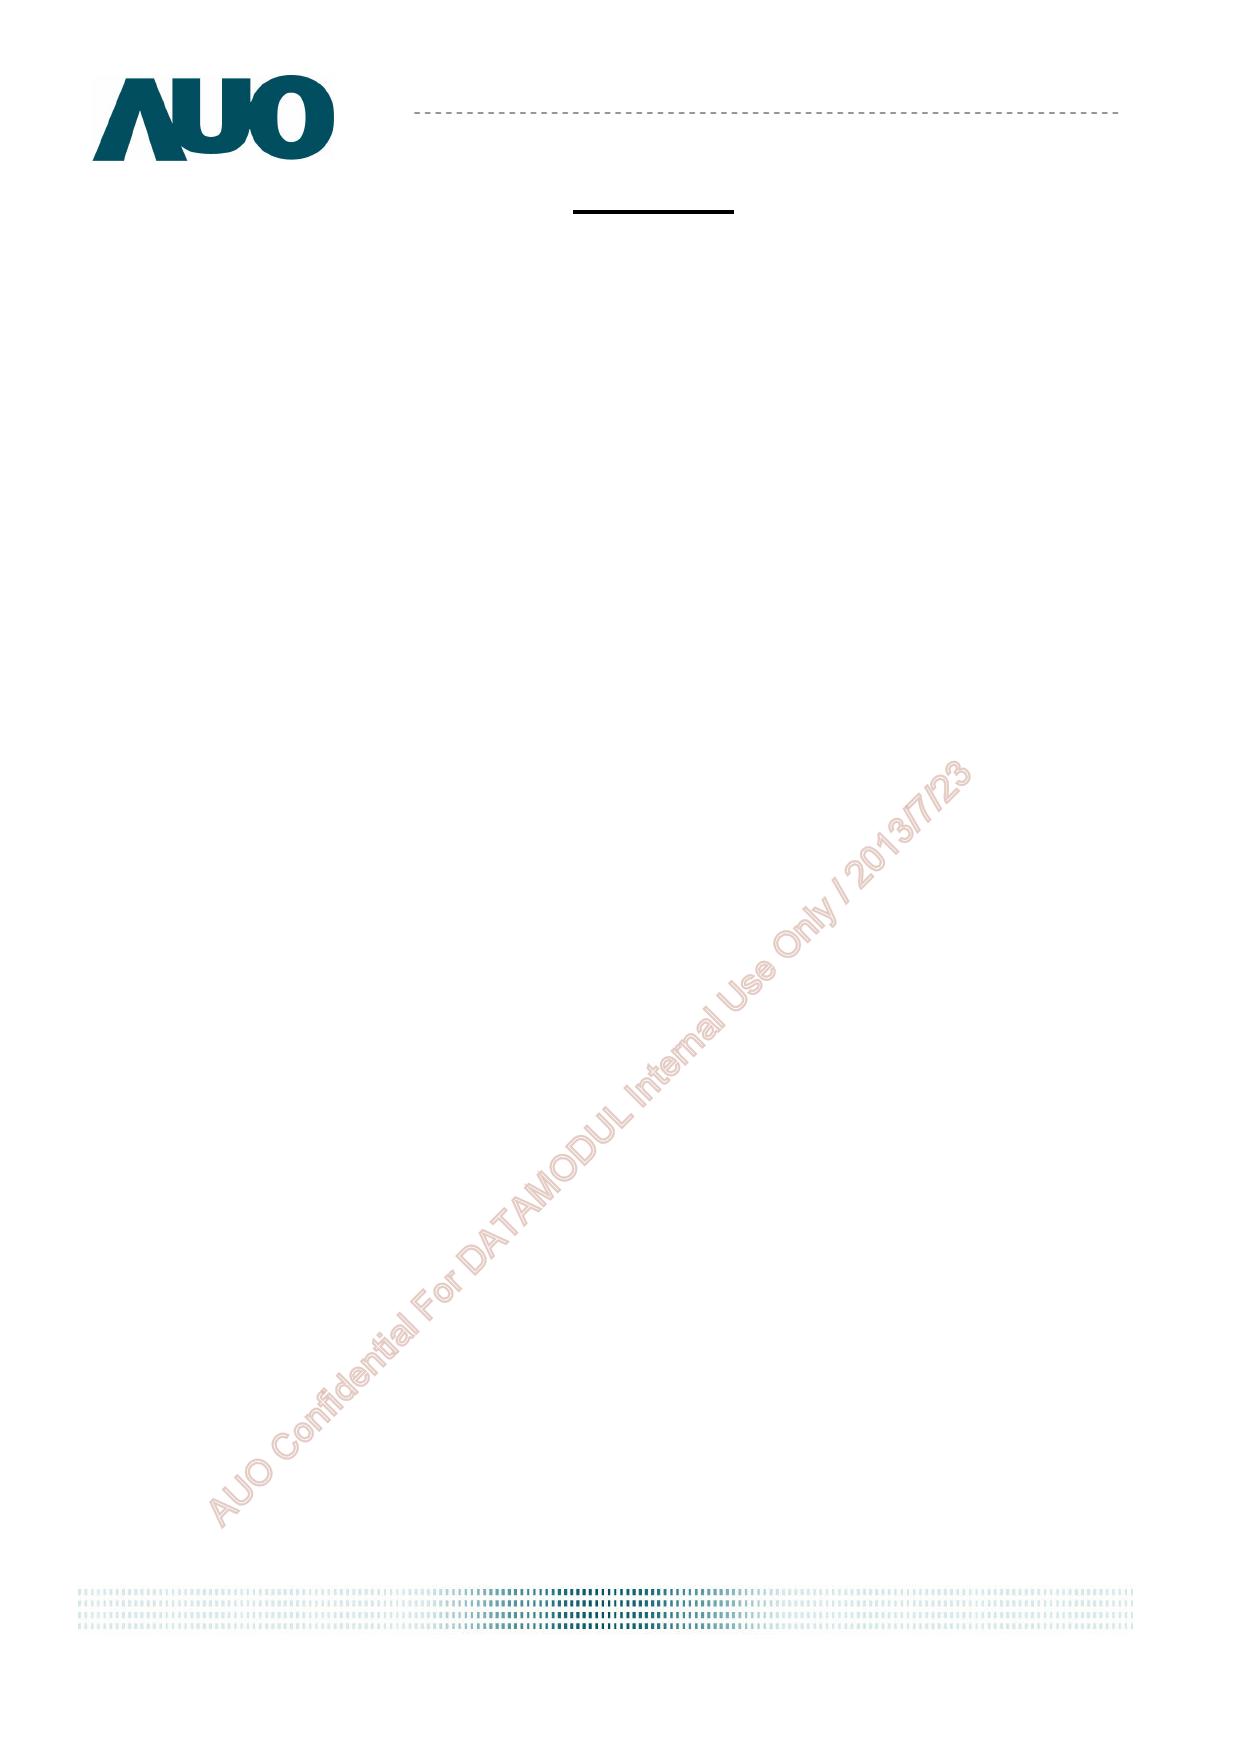 G057QN01-V2 Даташит, Описание, Даташиты